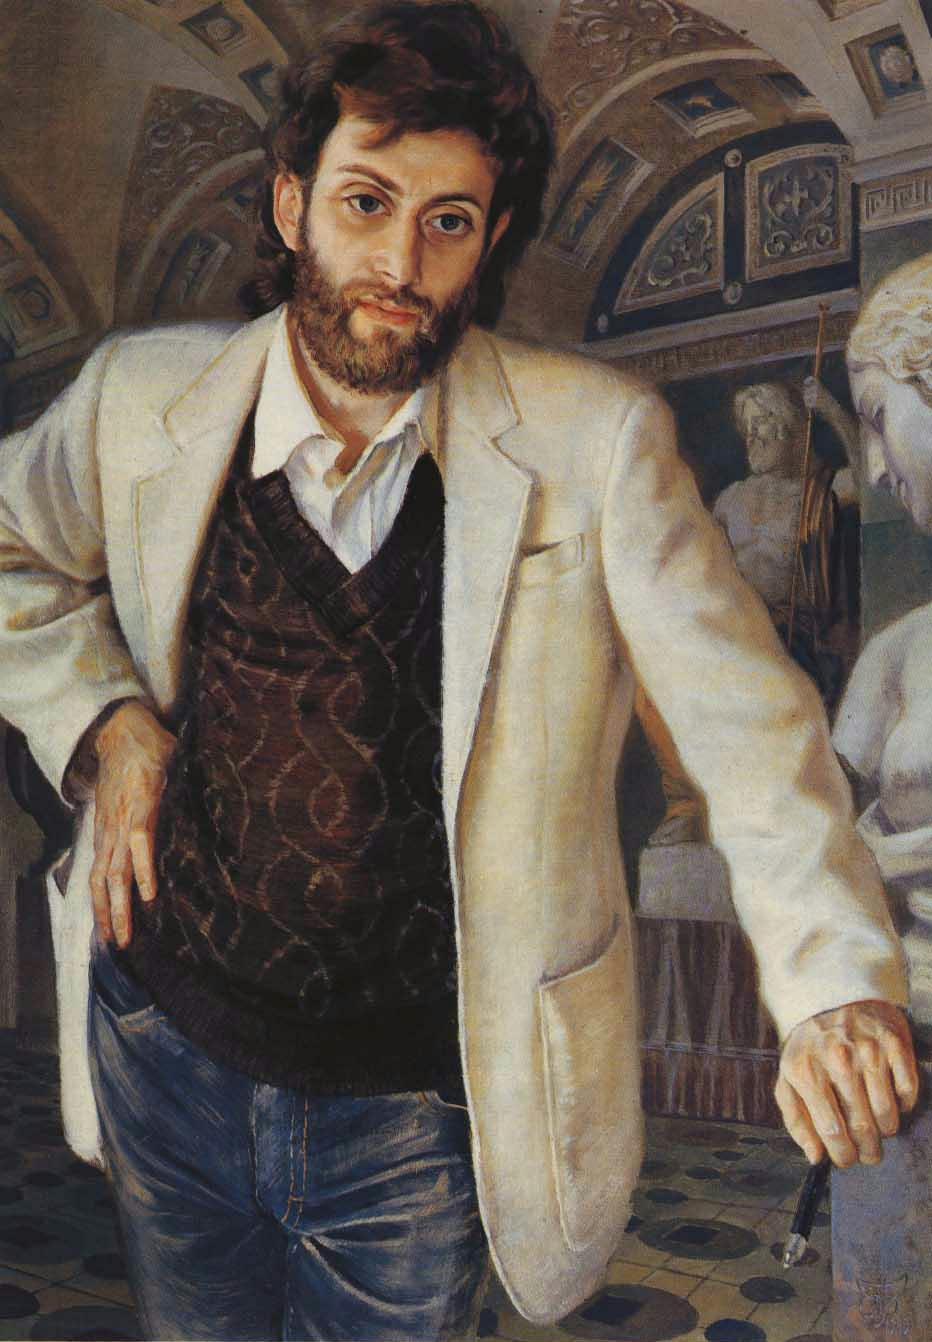 Yuri Vladimirovich Pugachev. Sculptor portrait